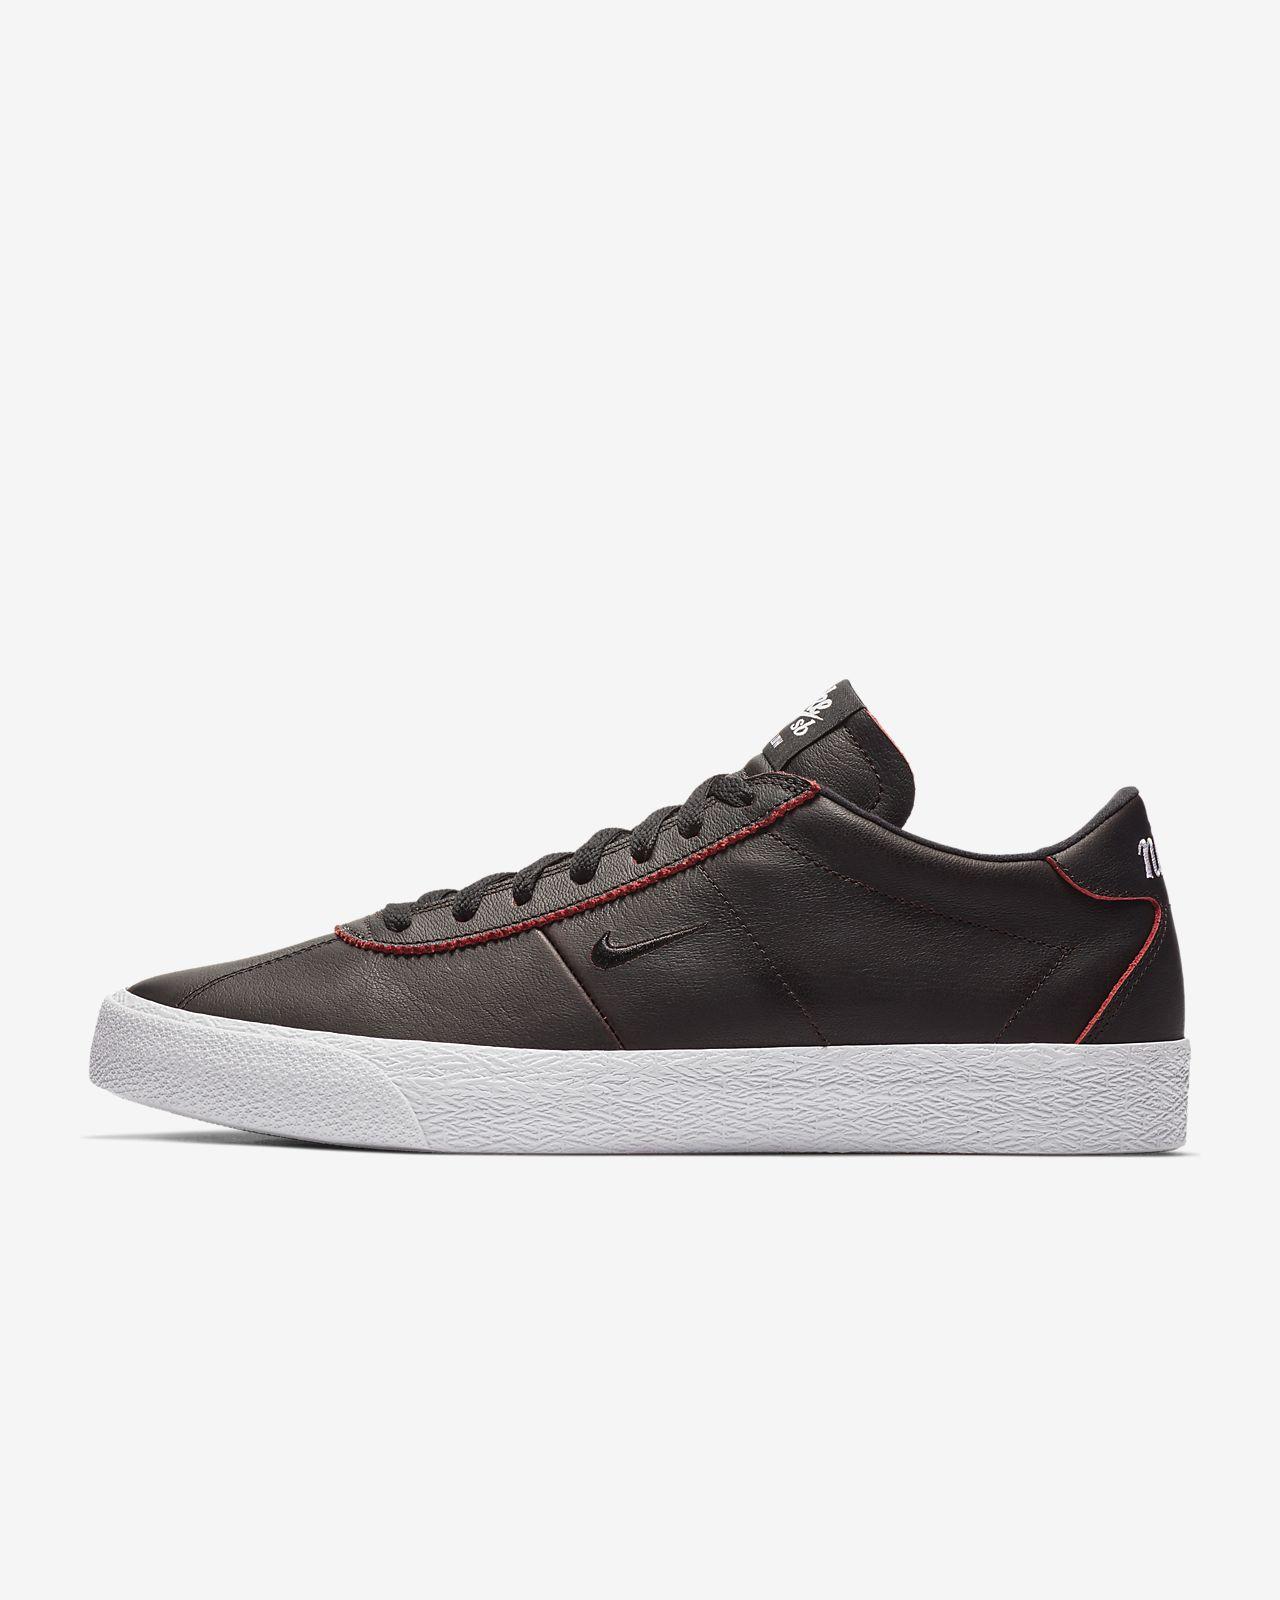 Nike SB Zoom Bruin NBA Skateboardschuh